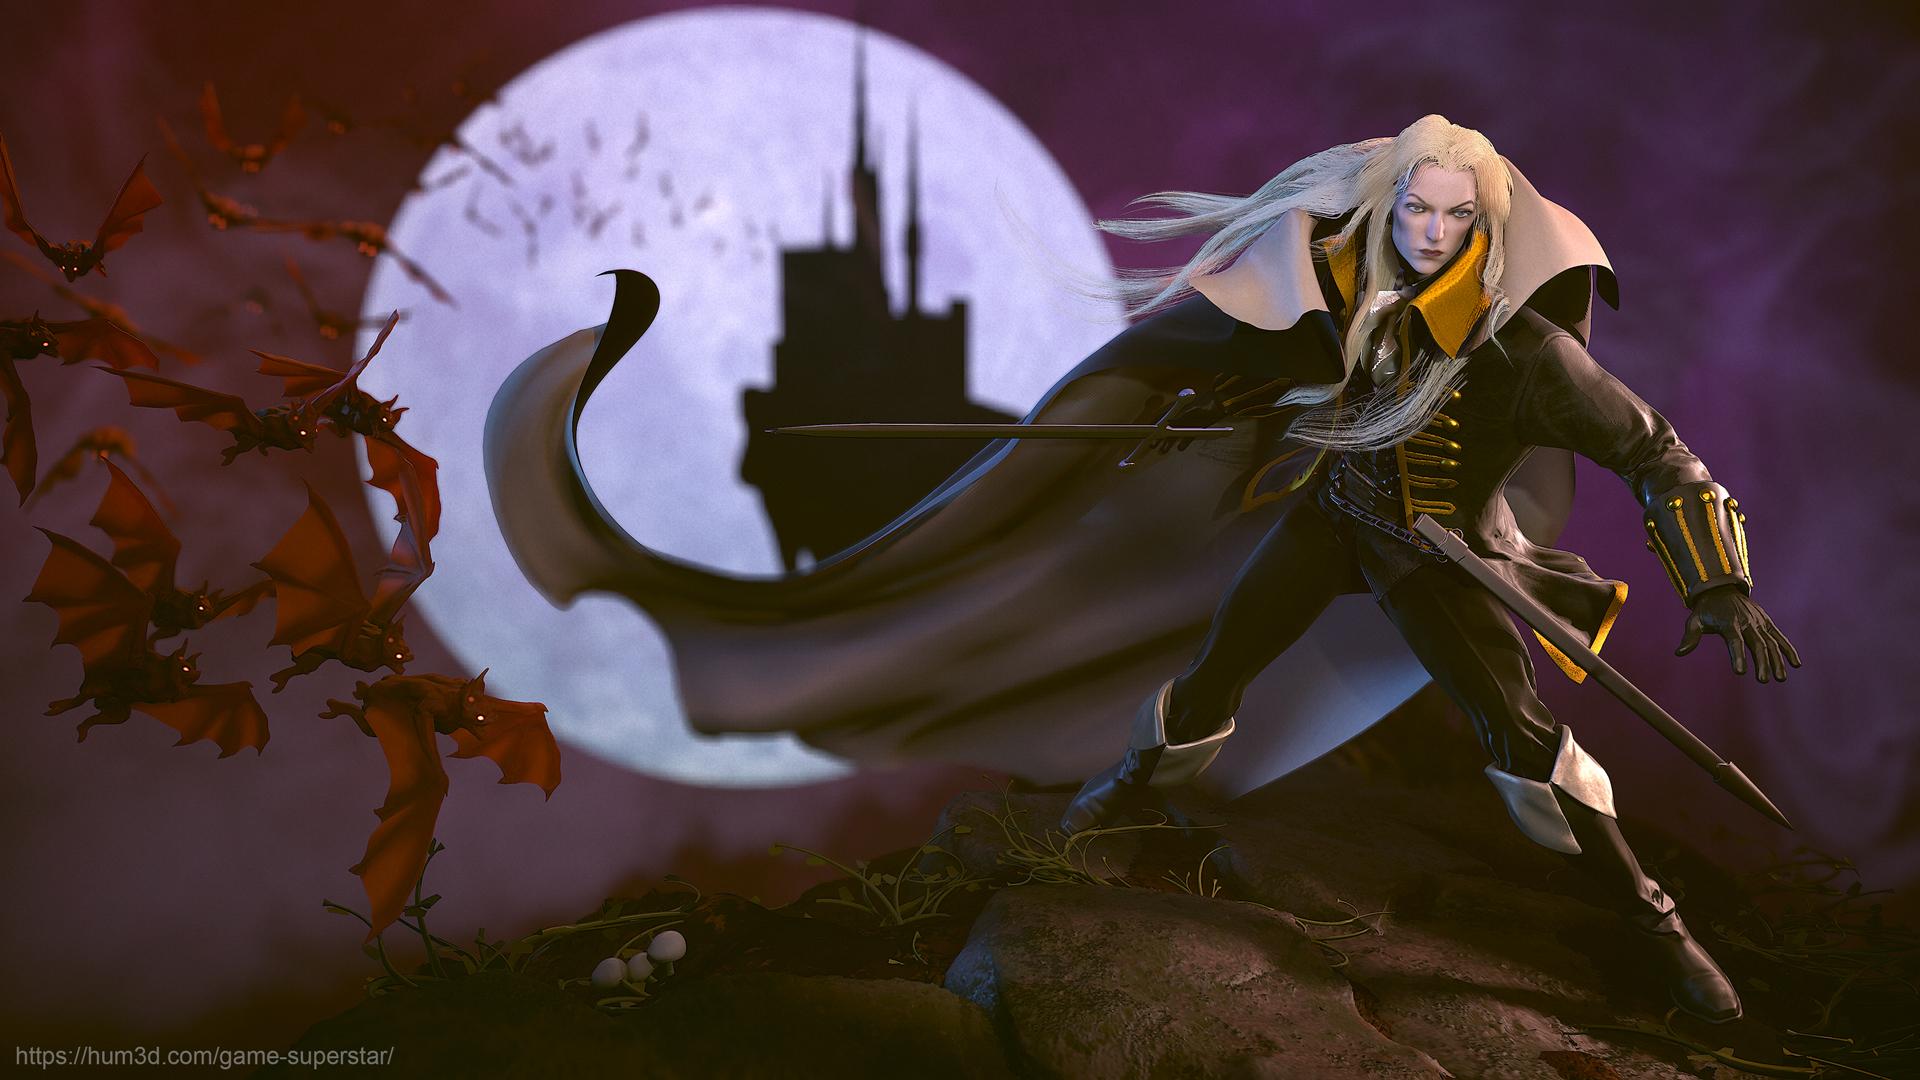 Castlevania Symphony of the Night: Alucard 3d art